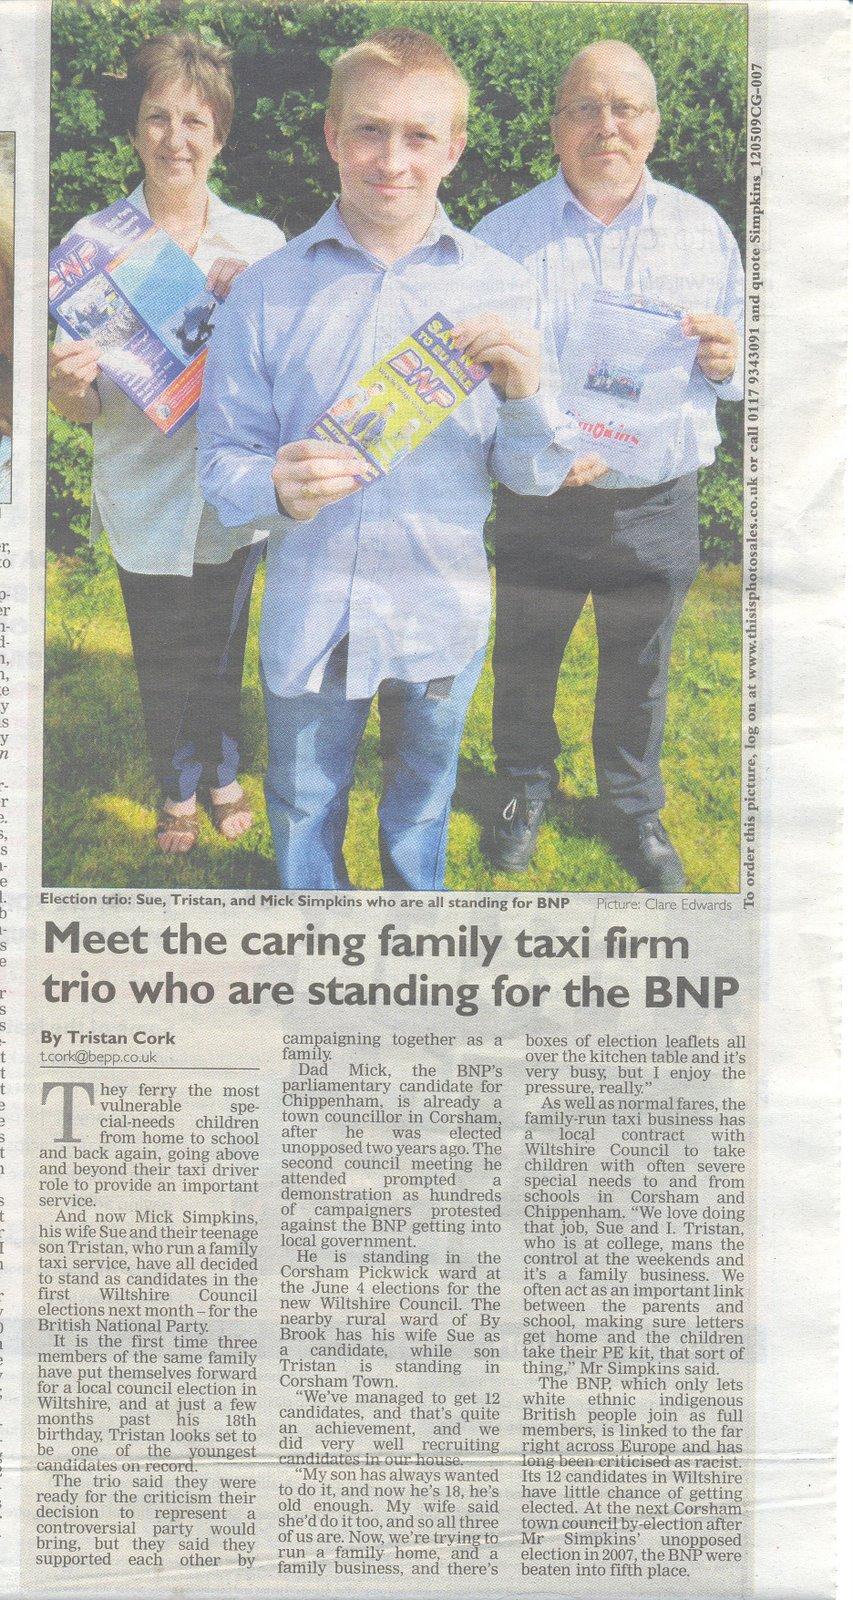 Western Daily Press, BNP family